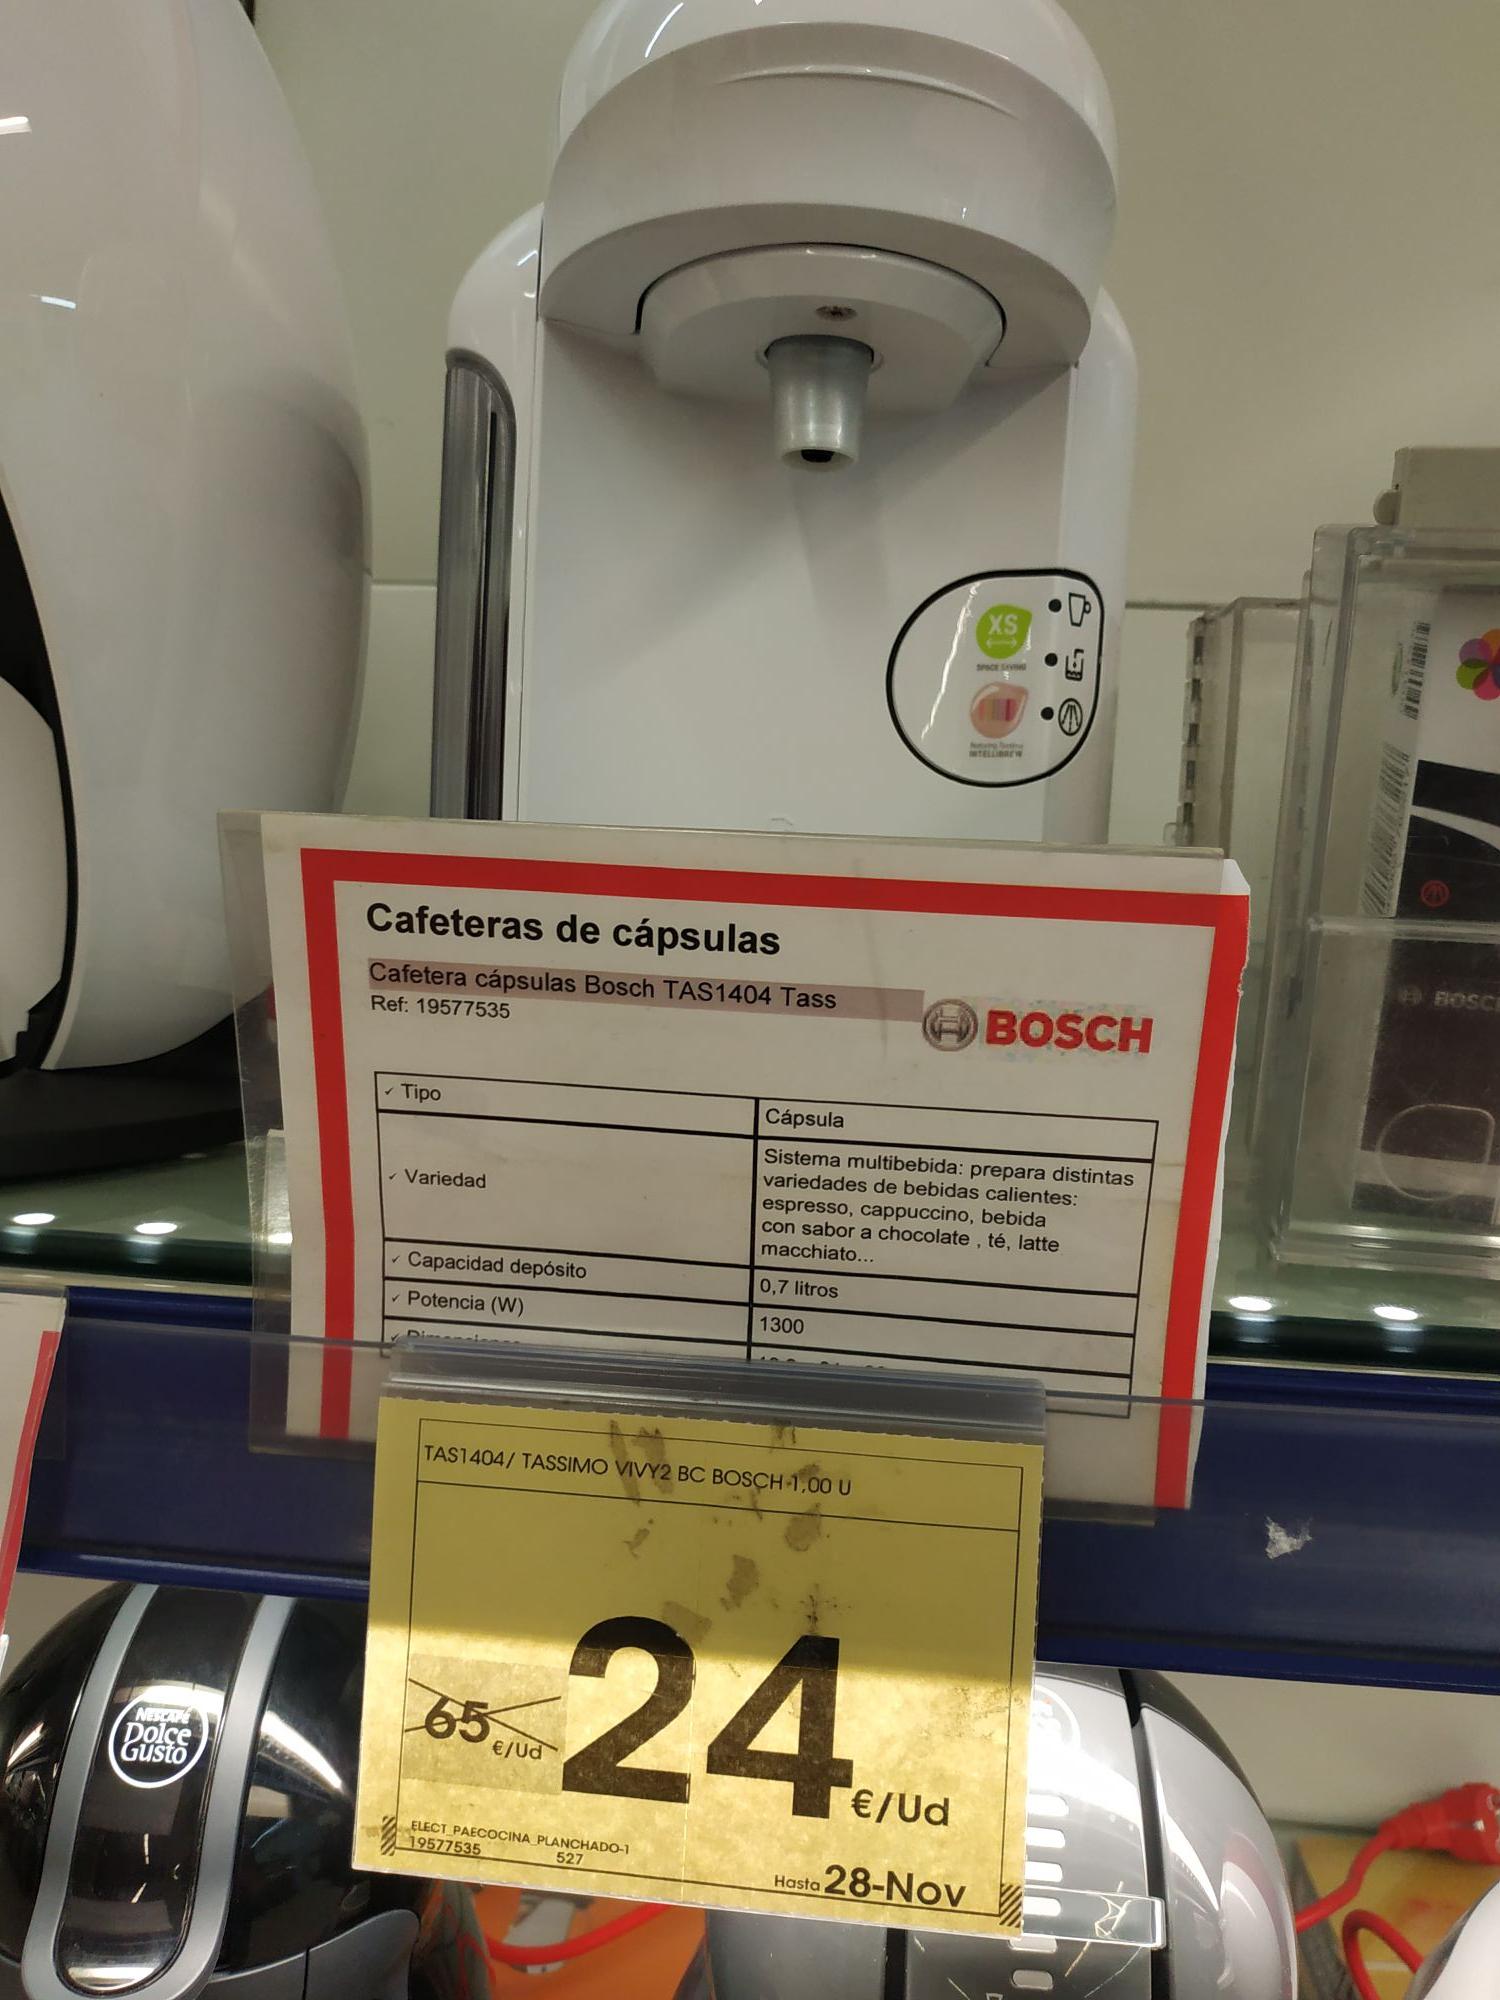 Cafetera cápsulas Bosch Tassimo Vivy